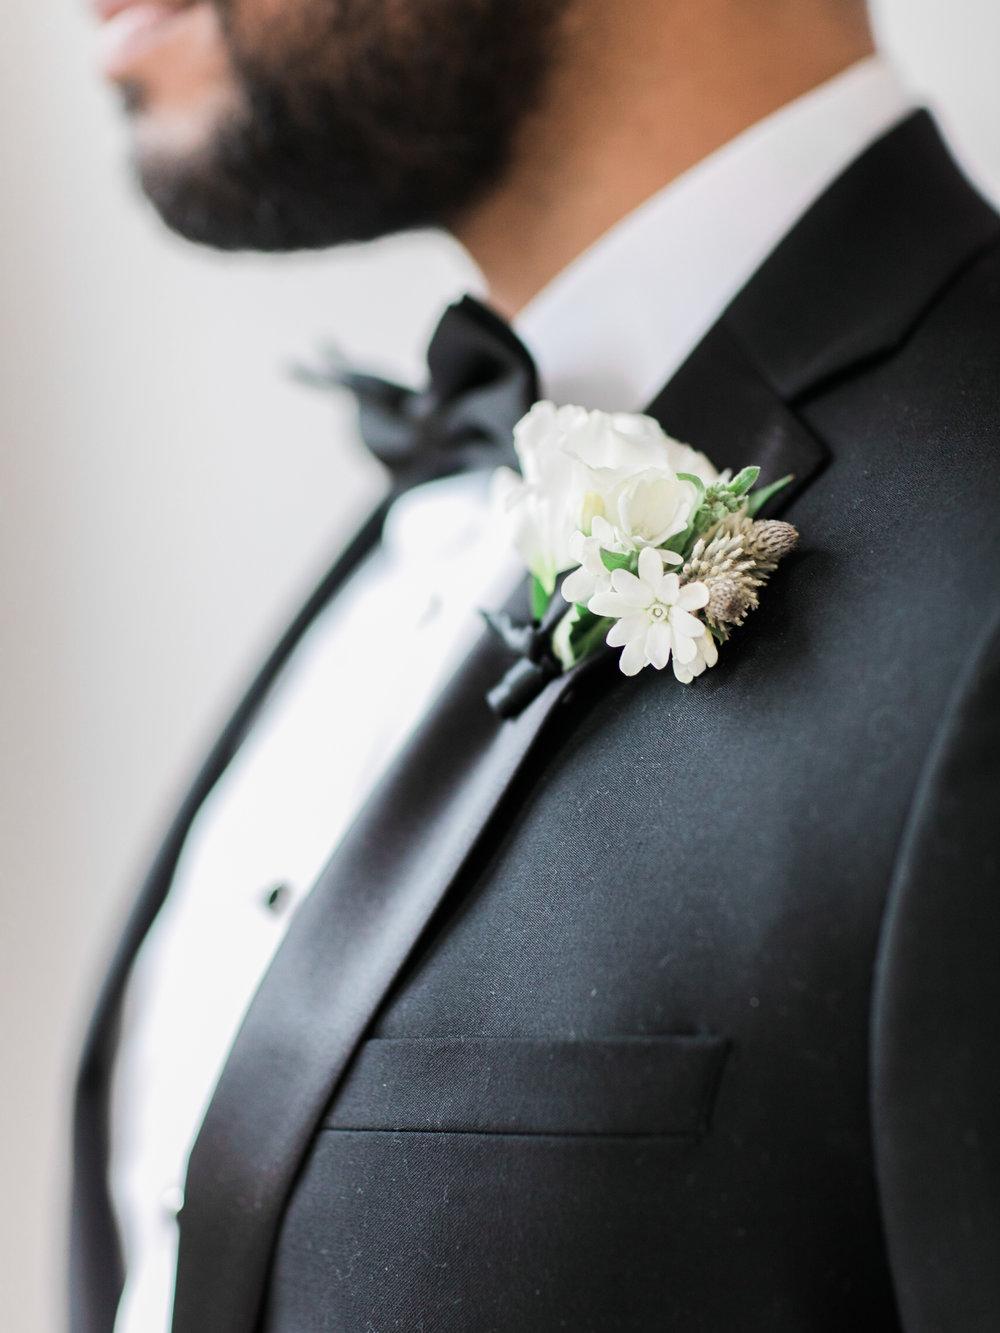 asher-gardner-photography-bryant-park-wedding-00215.jpg